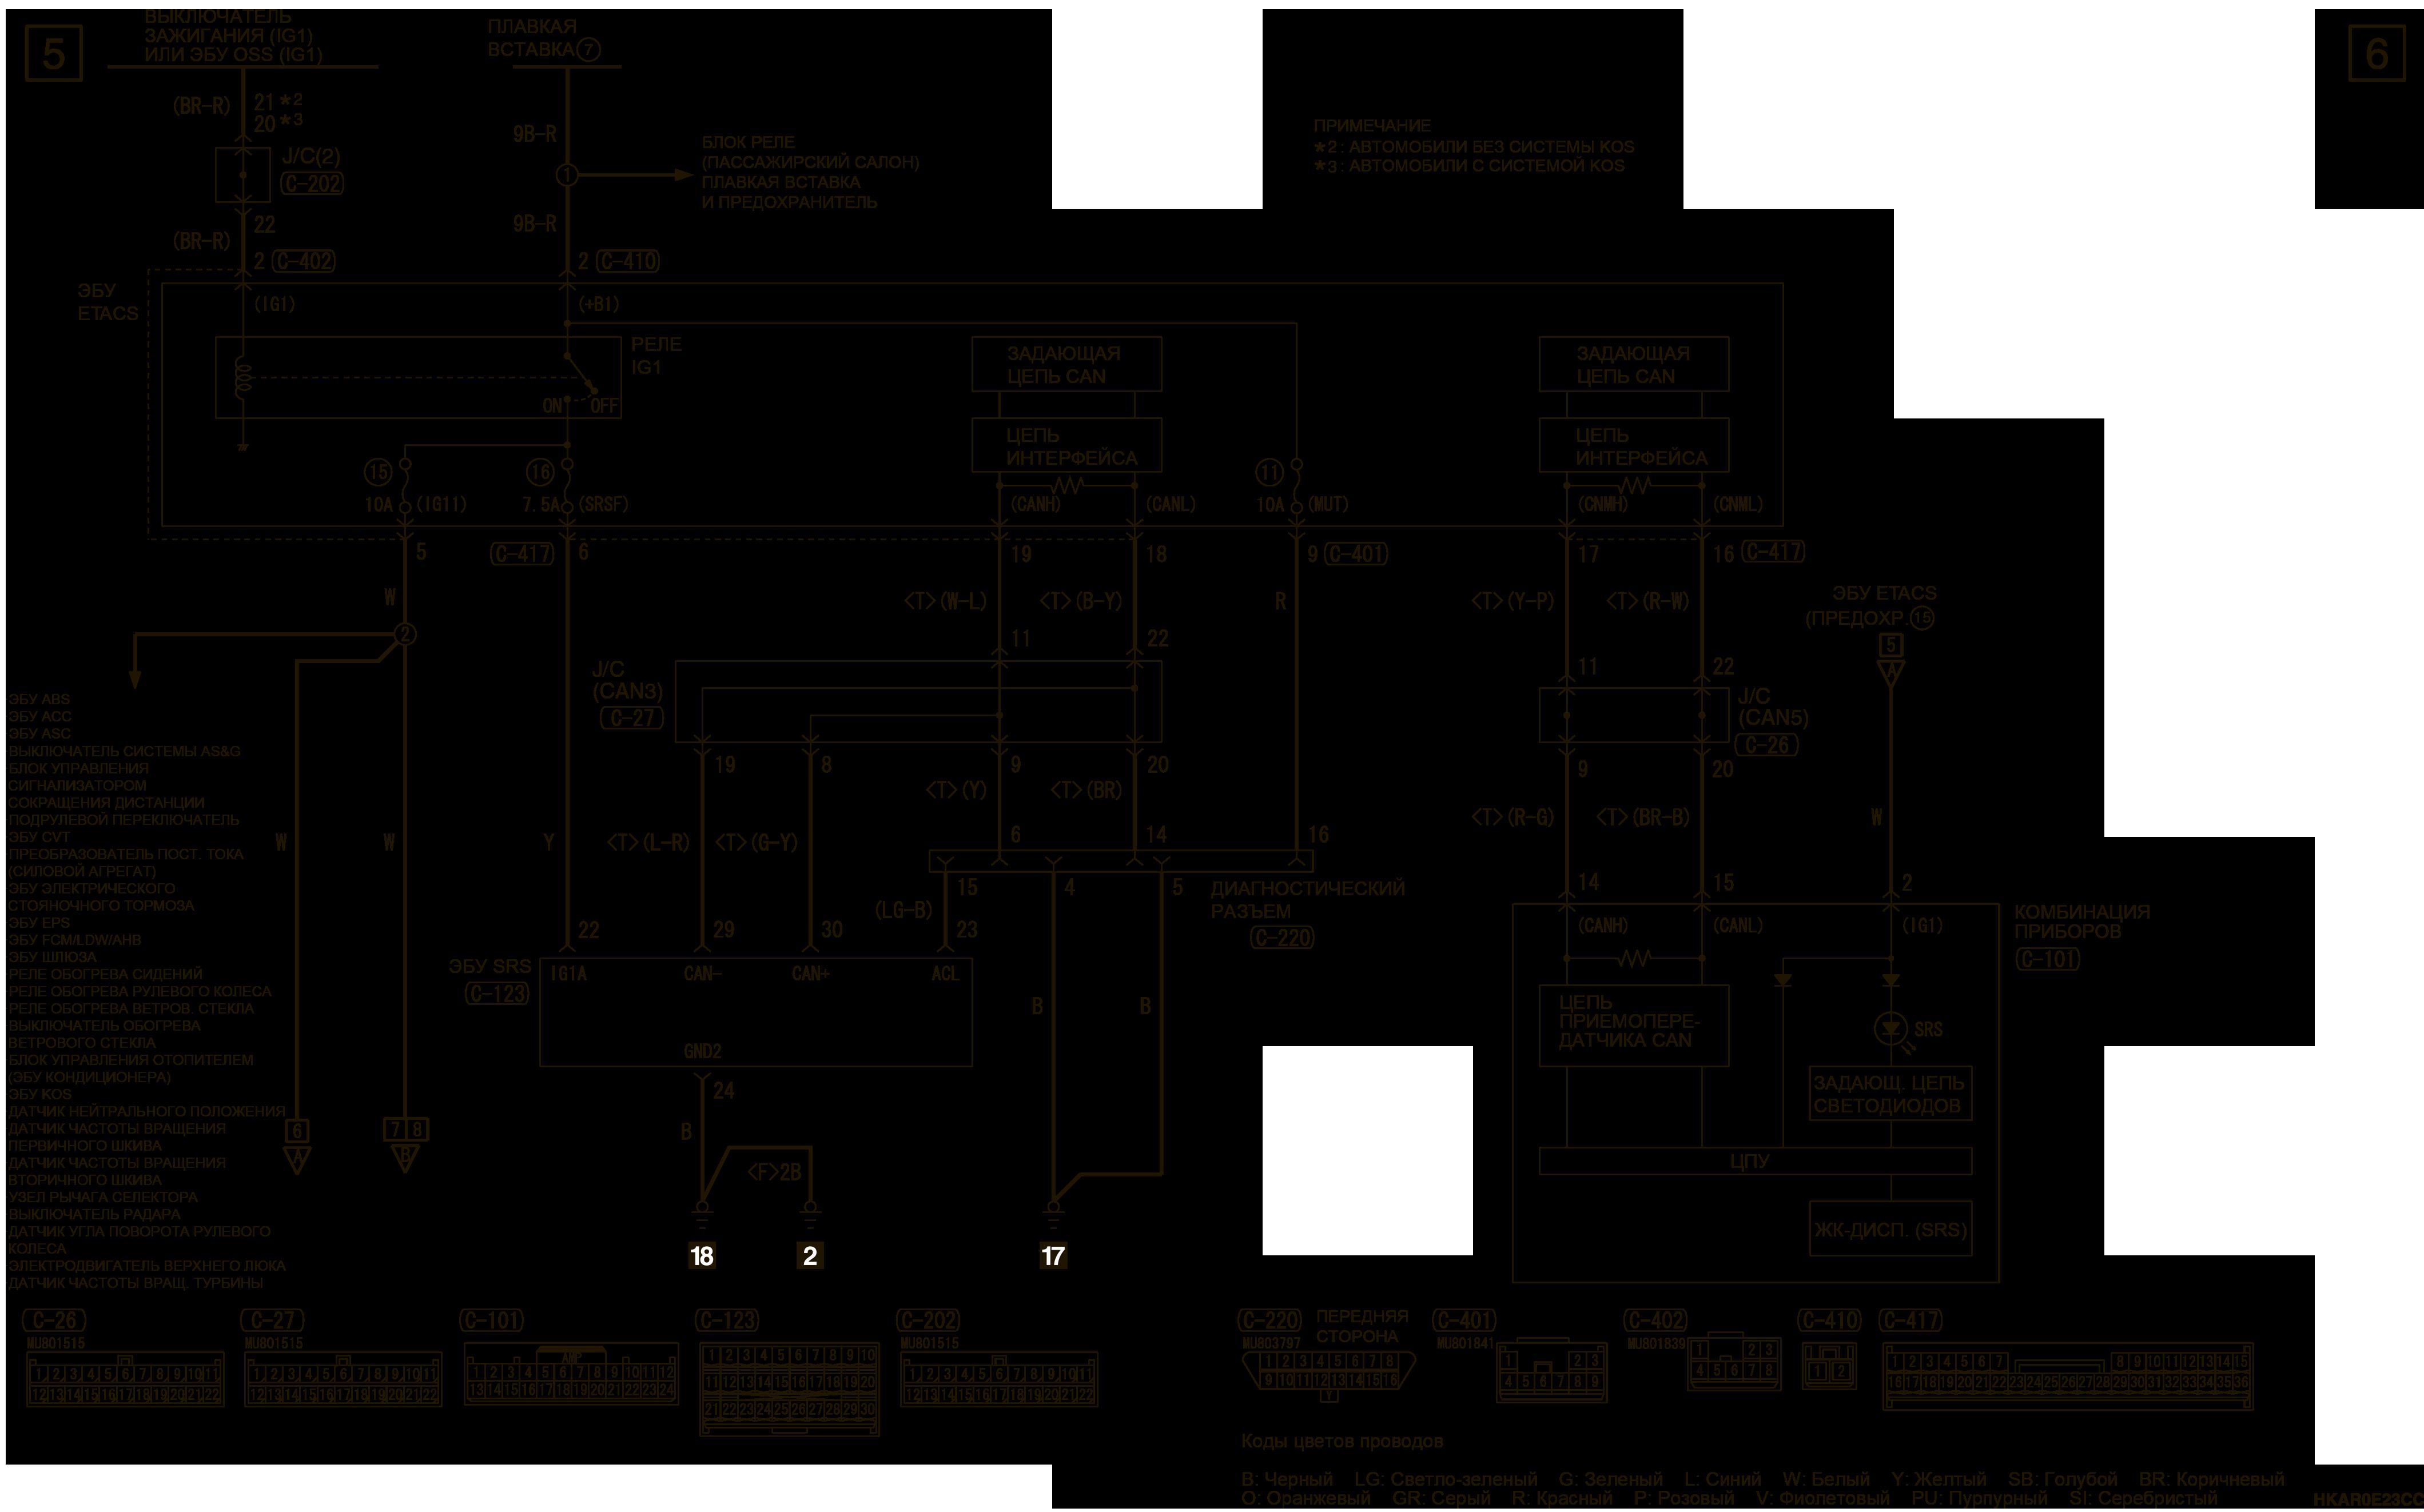 mmc аутлендер 3 2019 электросхемаSRS Слева